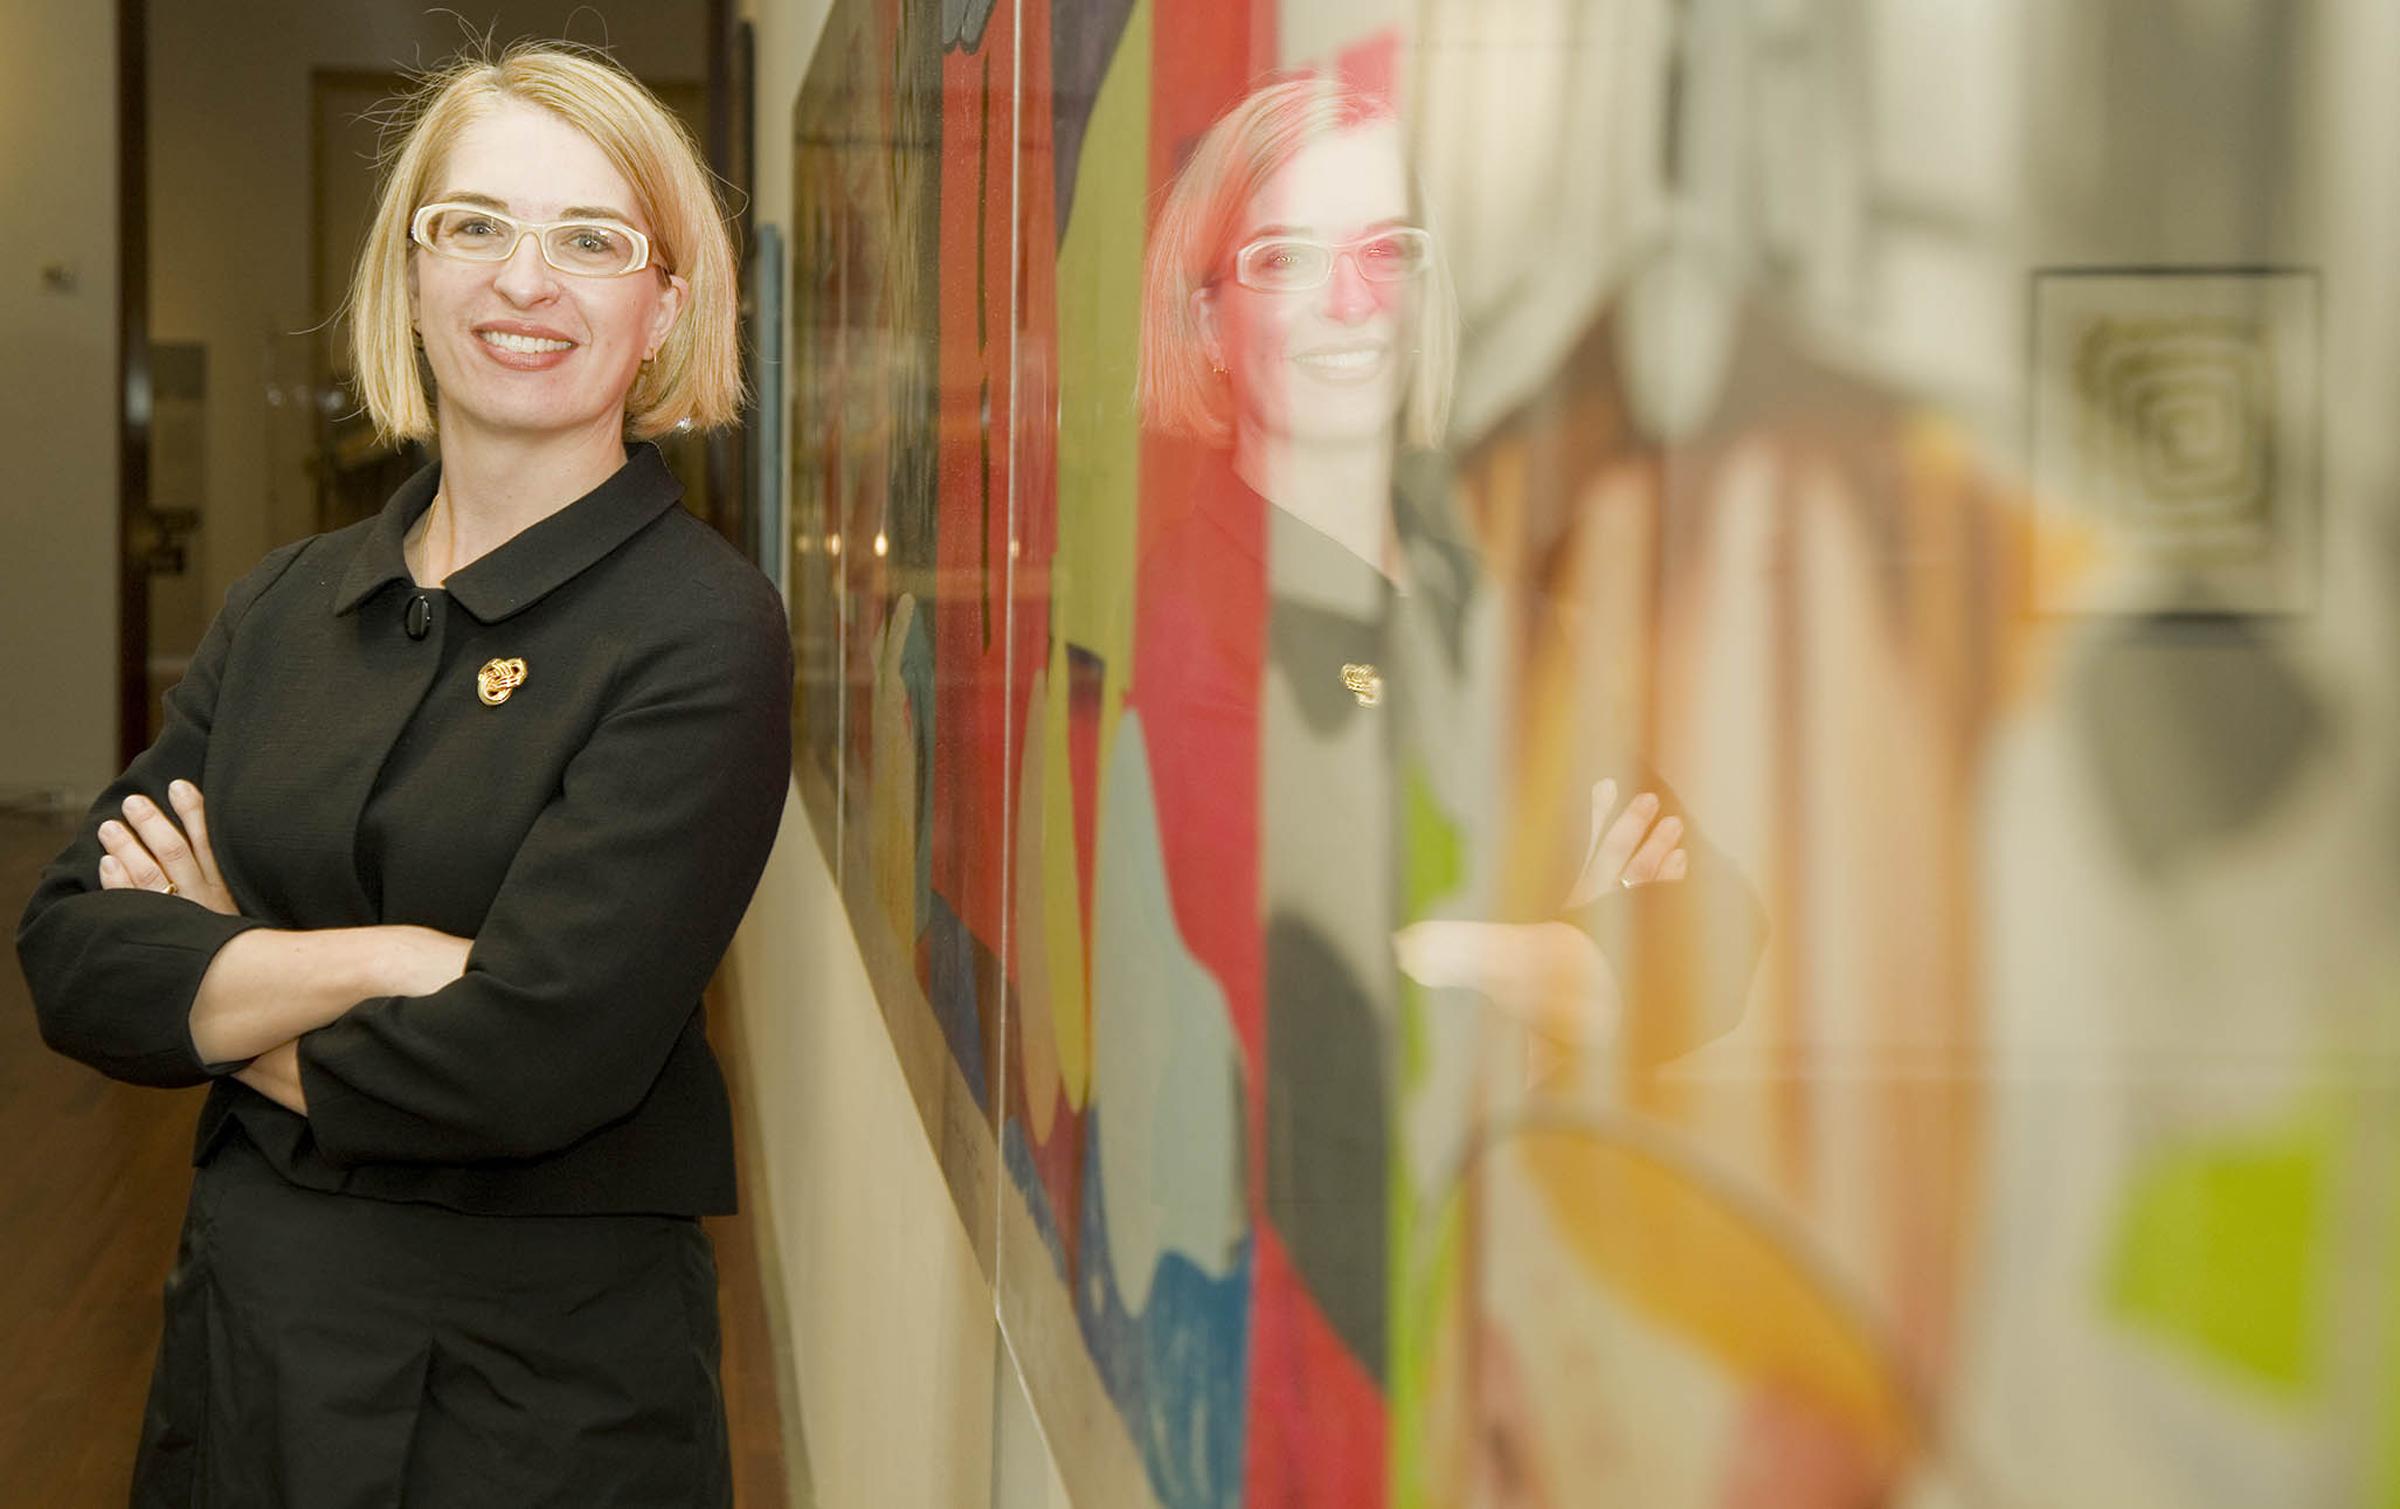 Utah Museum of Fine Arts Executive Director Gretchen Dietrich.